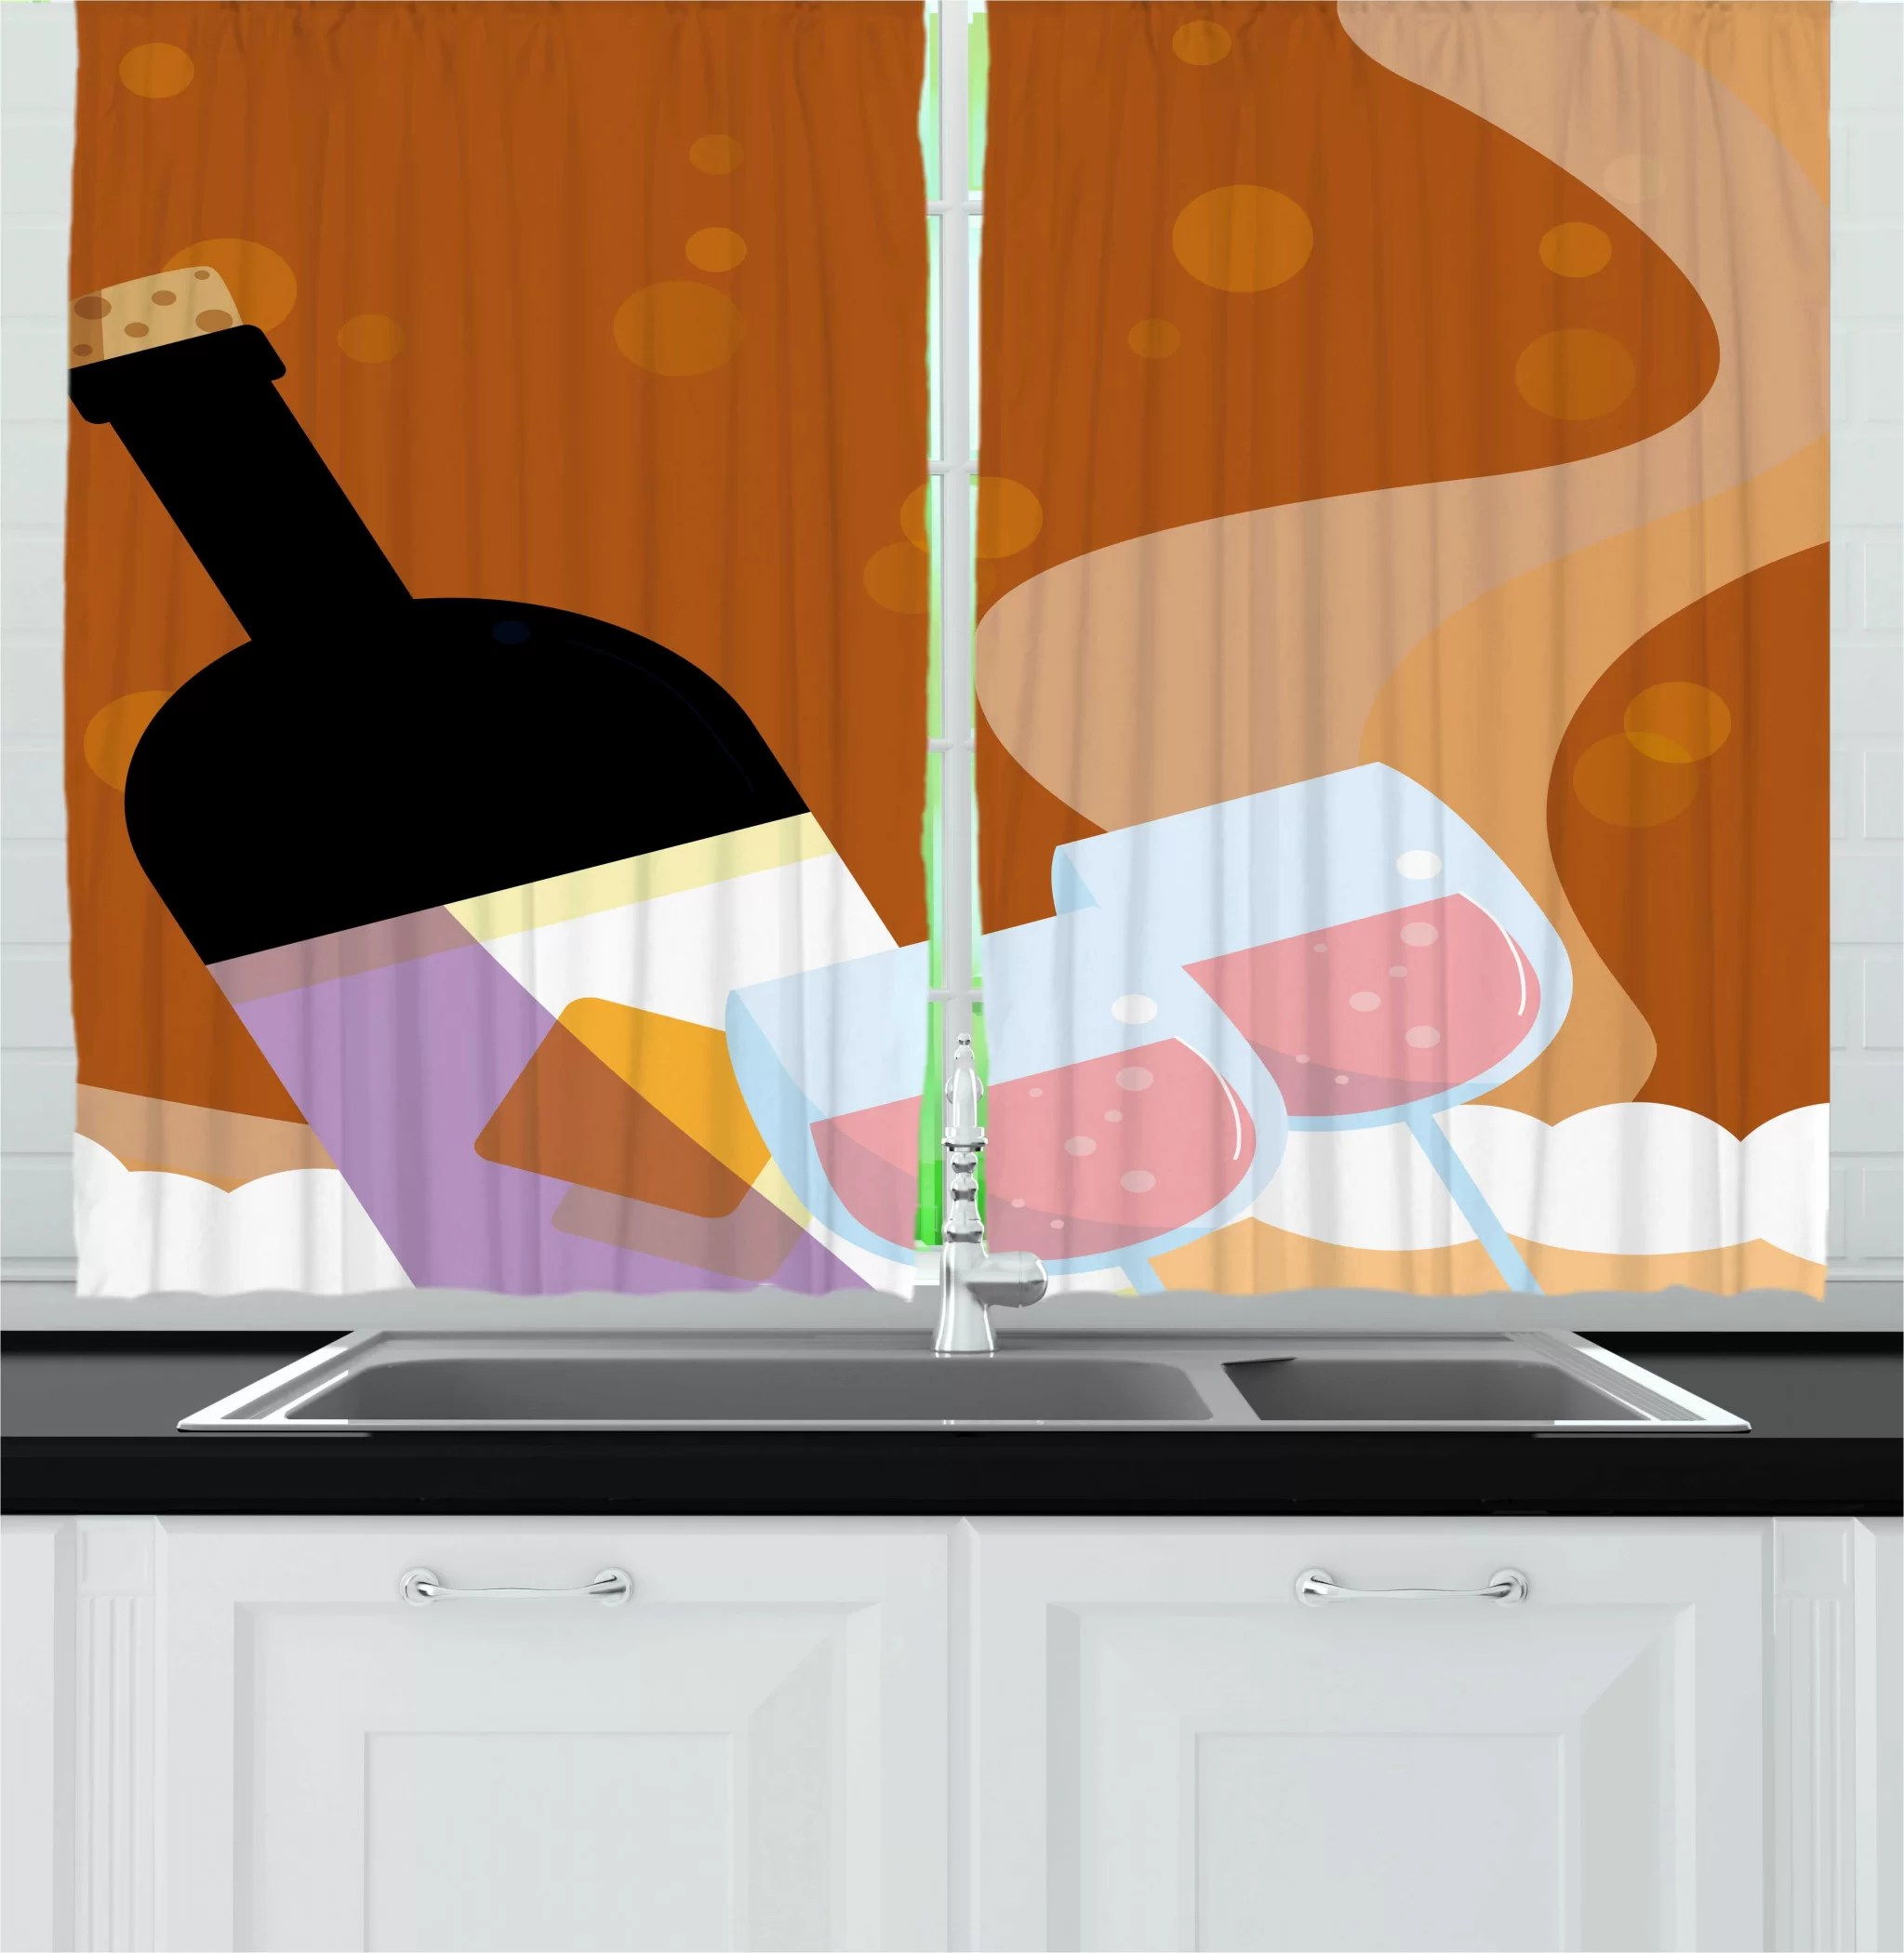 East Urban Home 2 Piece Merlot Rose Wine Bottle Glasses Bubbles Background Cartoon Kitchen Curtains Set Wayfair